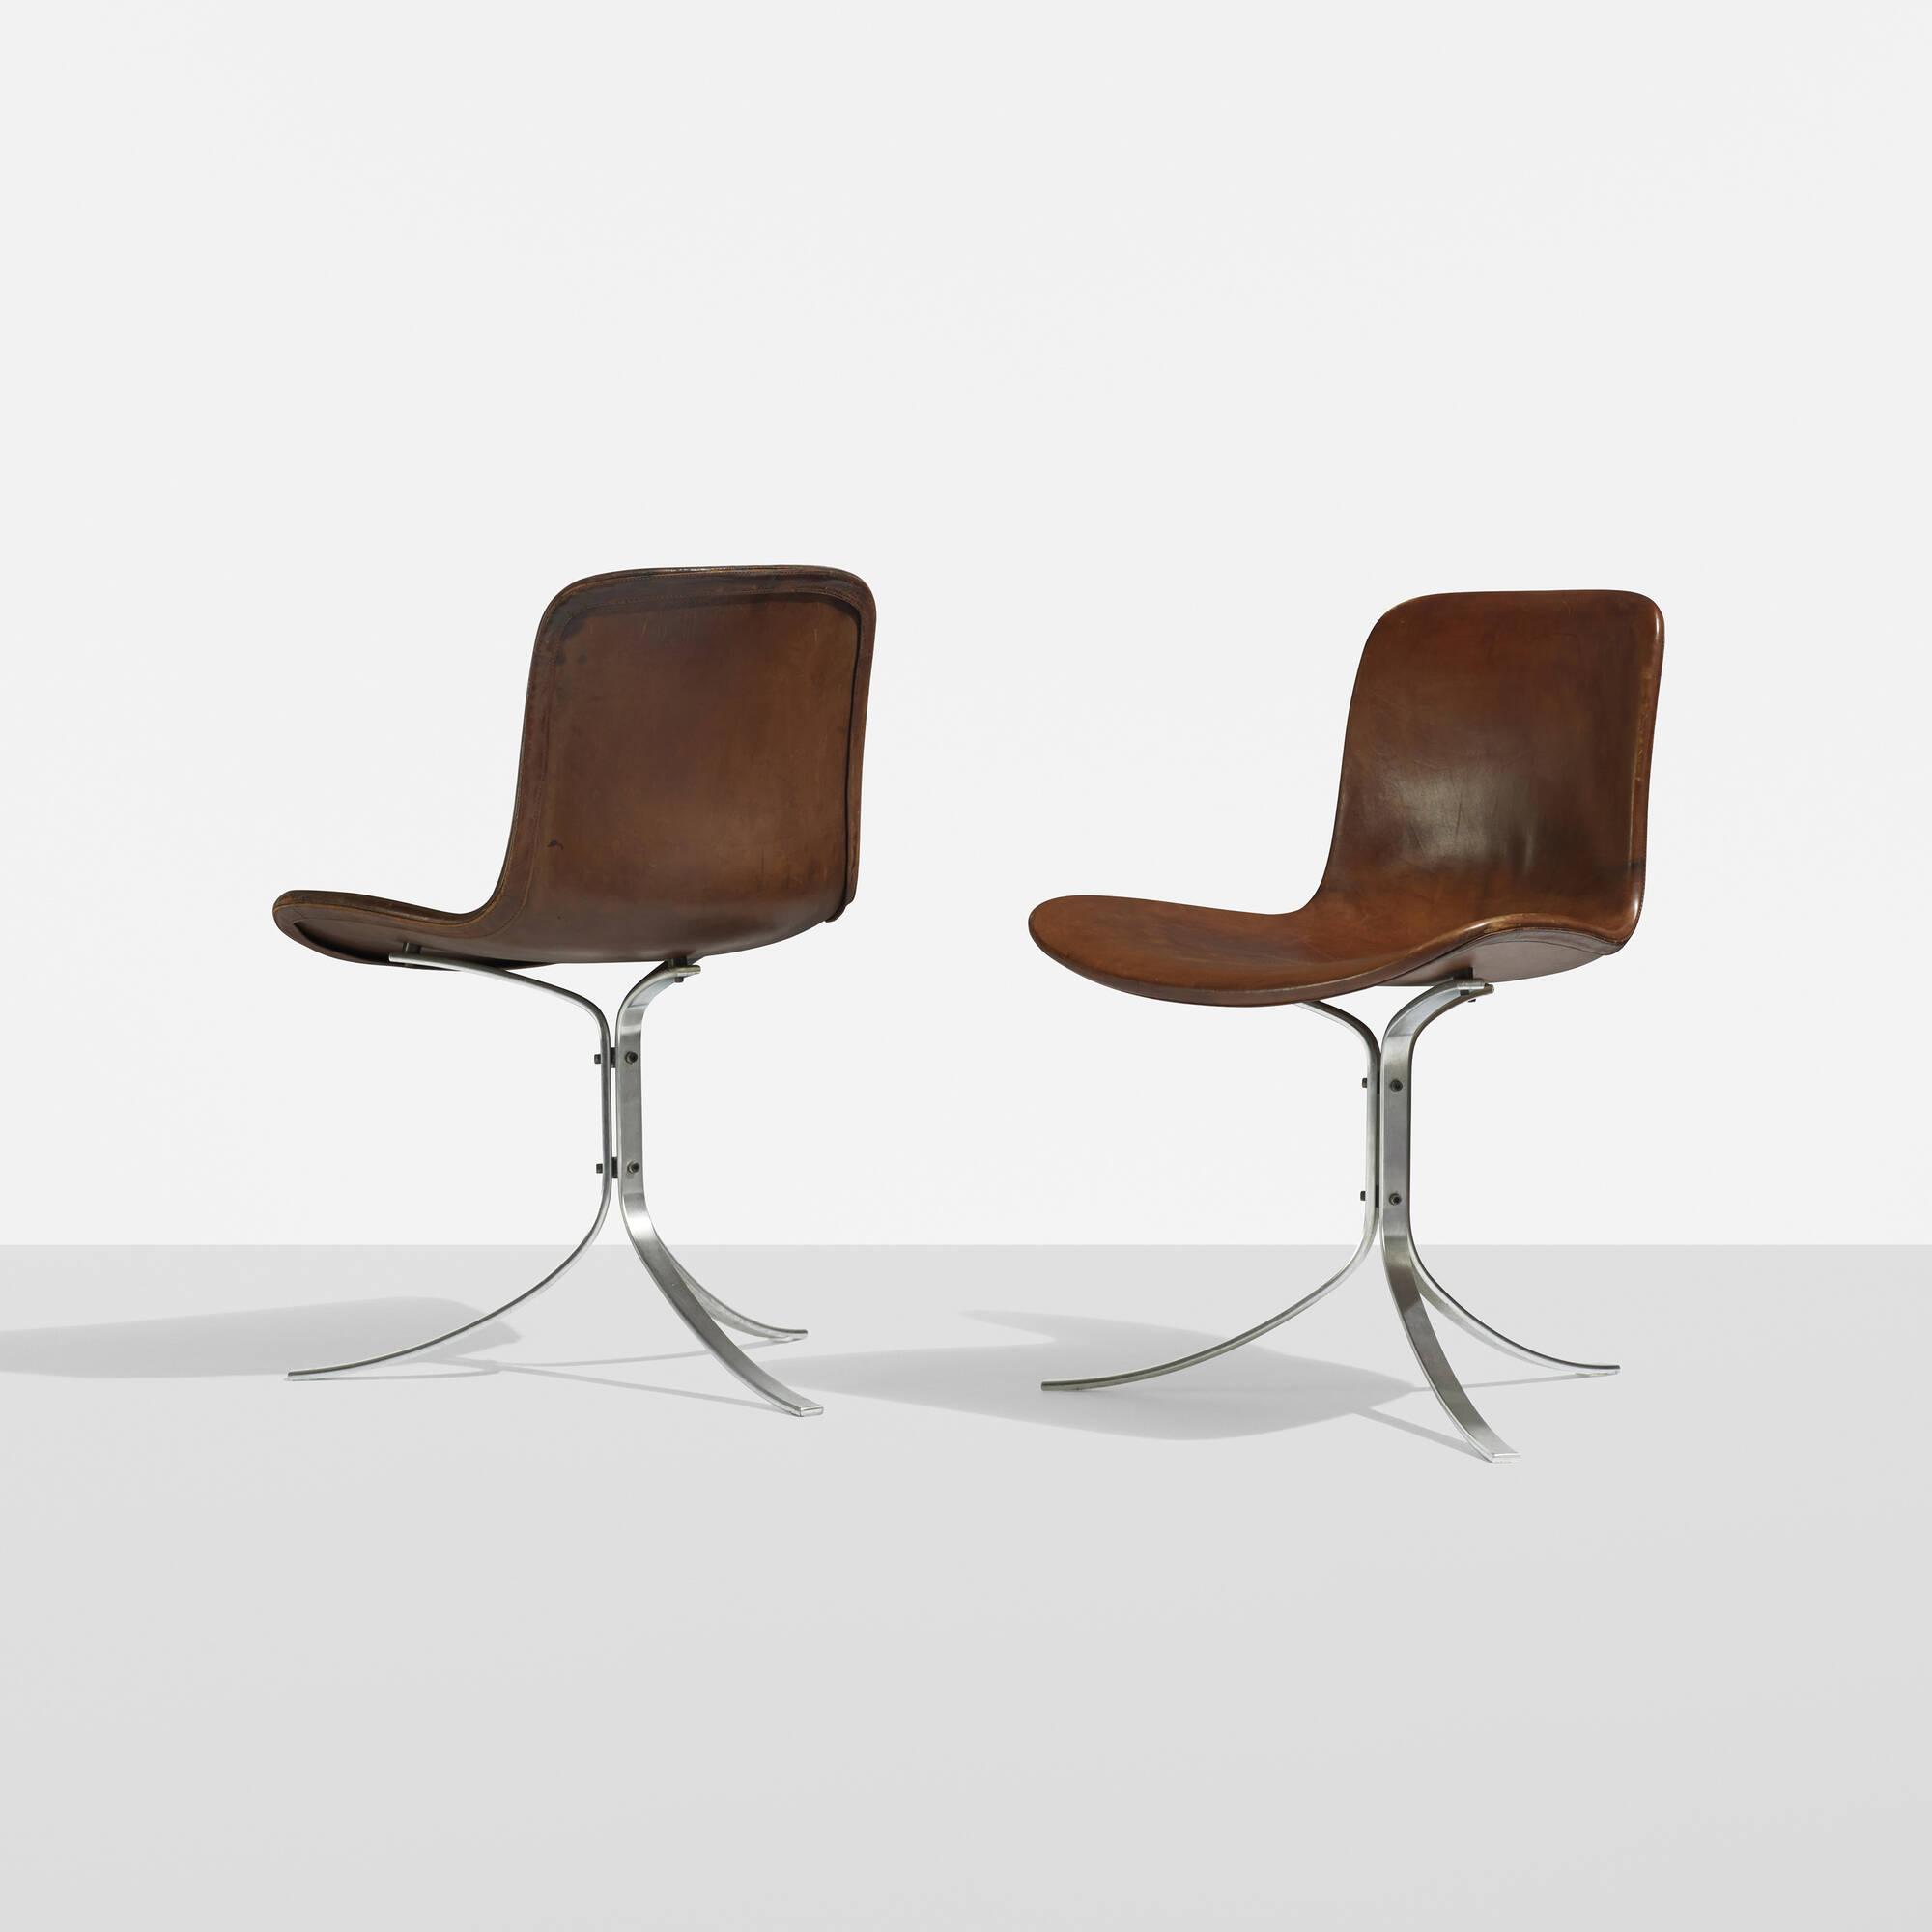 ... 326: Poul Kjaerholm / PK 9 Chairs, Pair (2 Of 4)